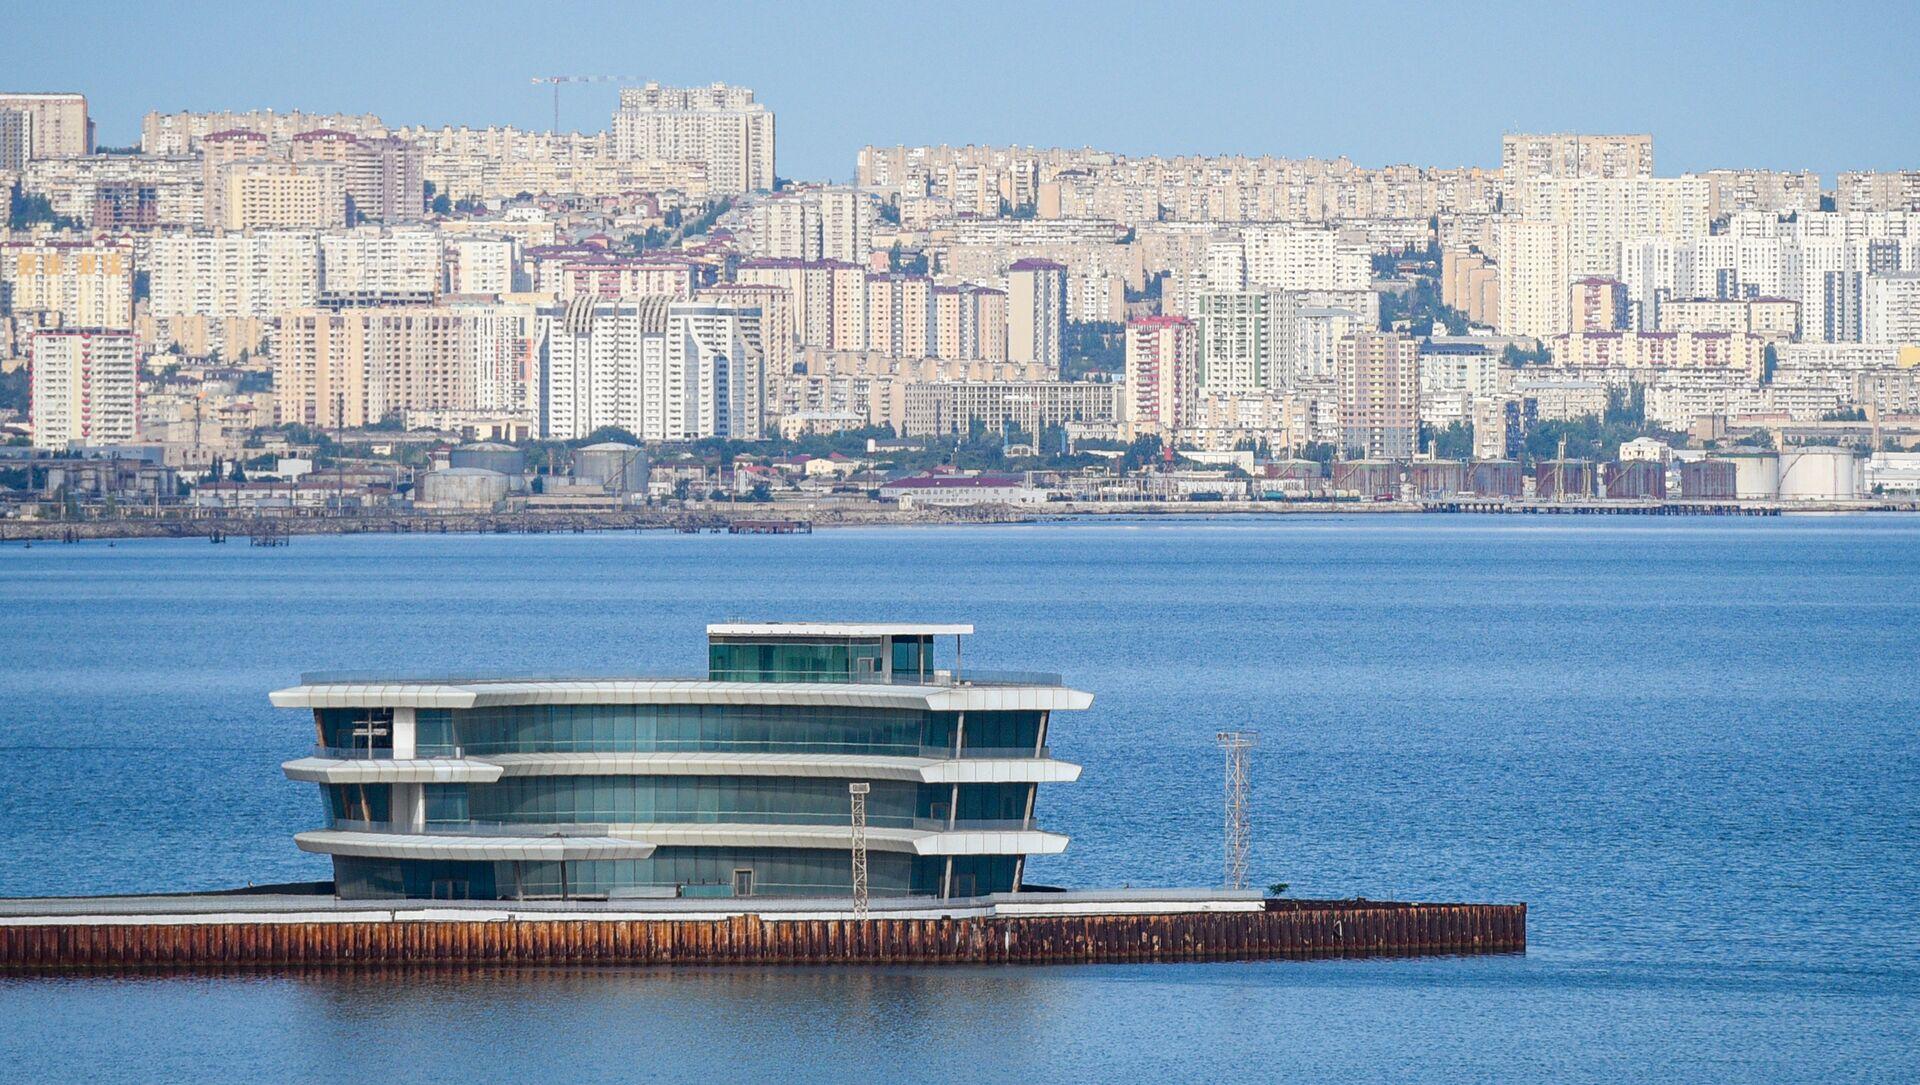 Вид на город Баку, фото из архива - Sputnik Азербайджан, 1920, 09.08.2021